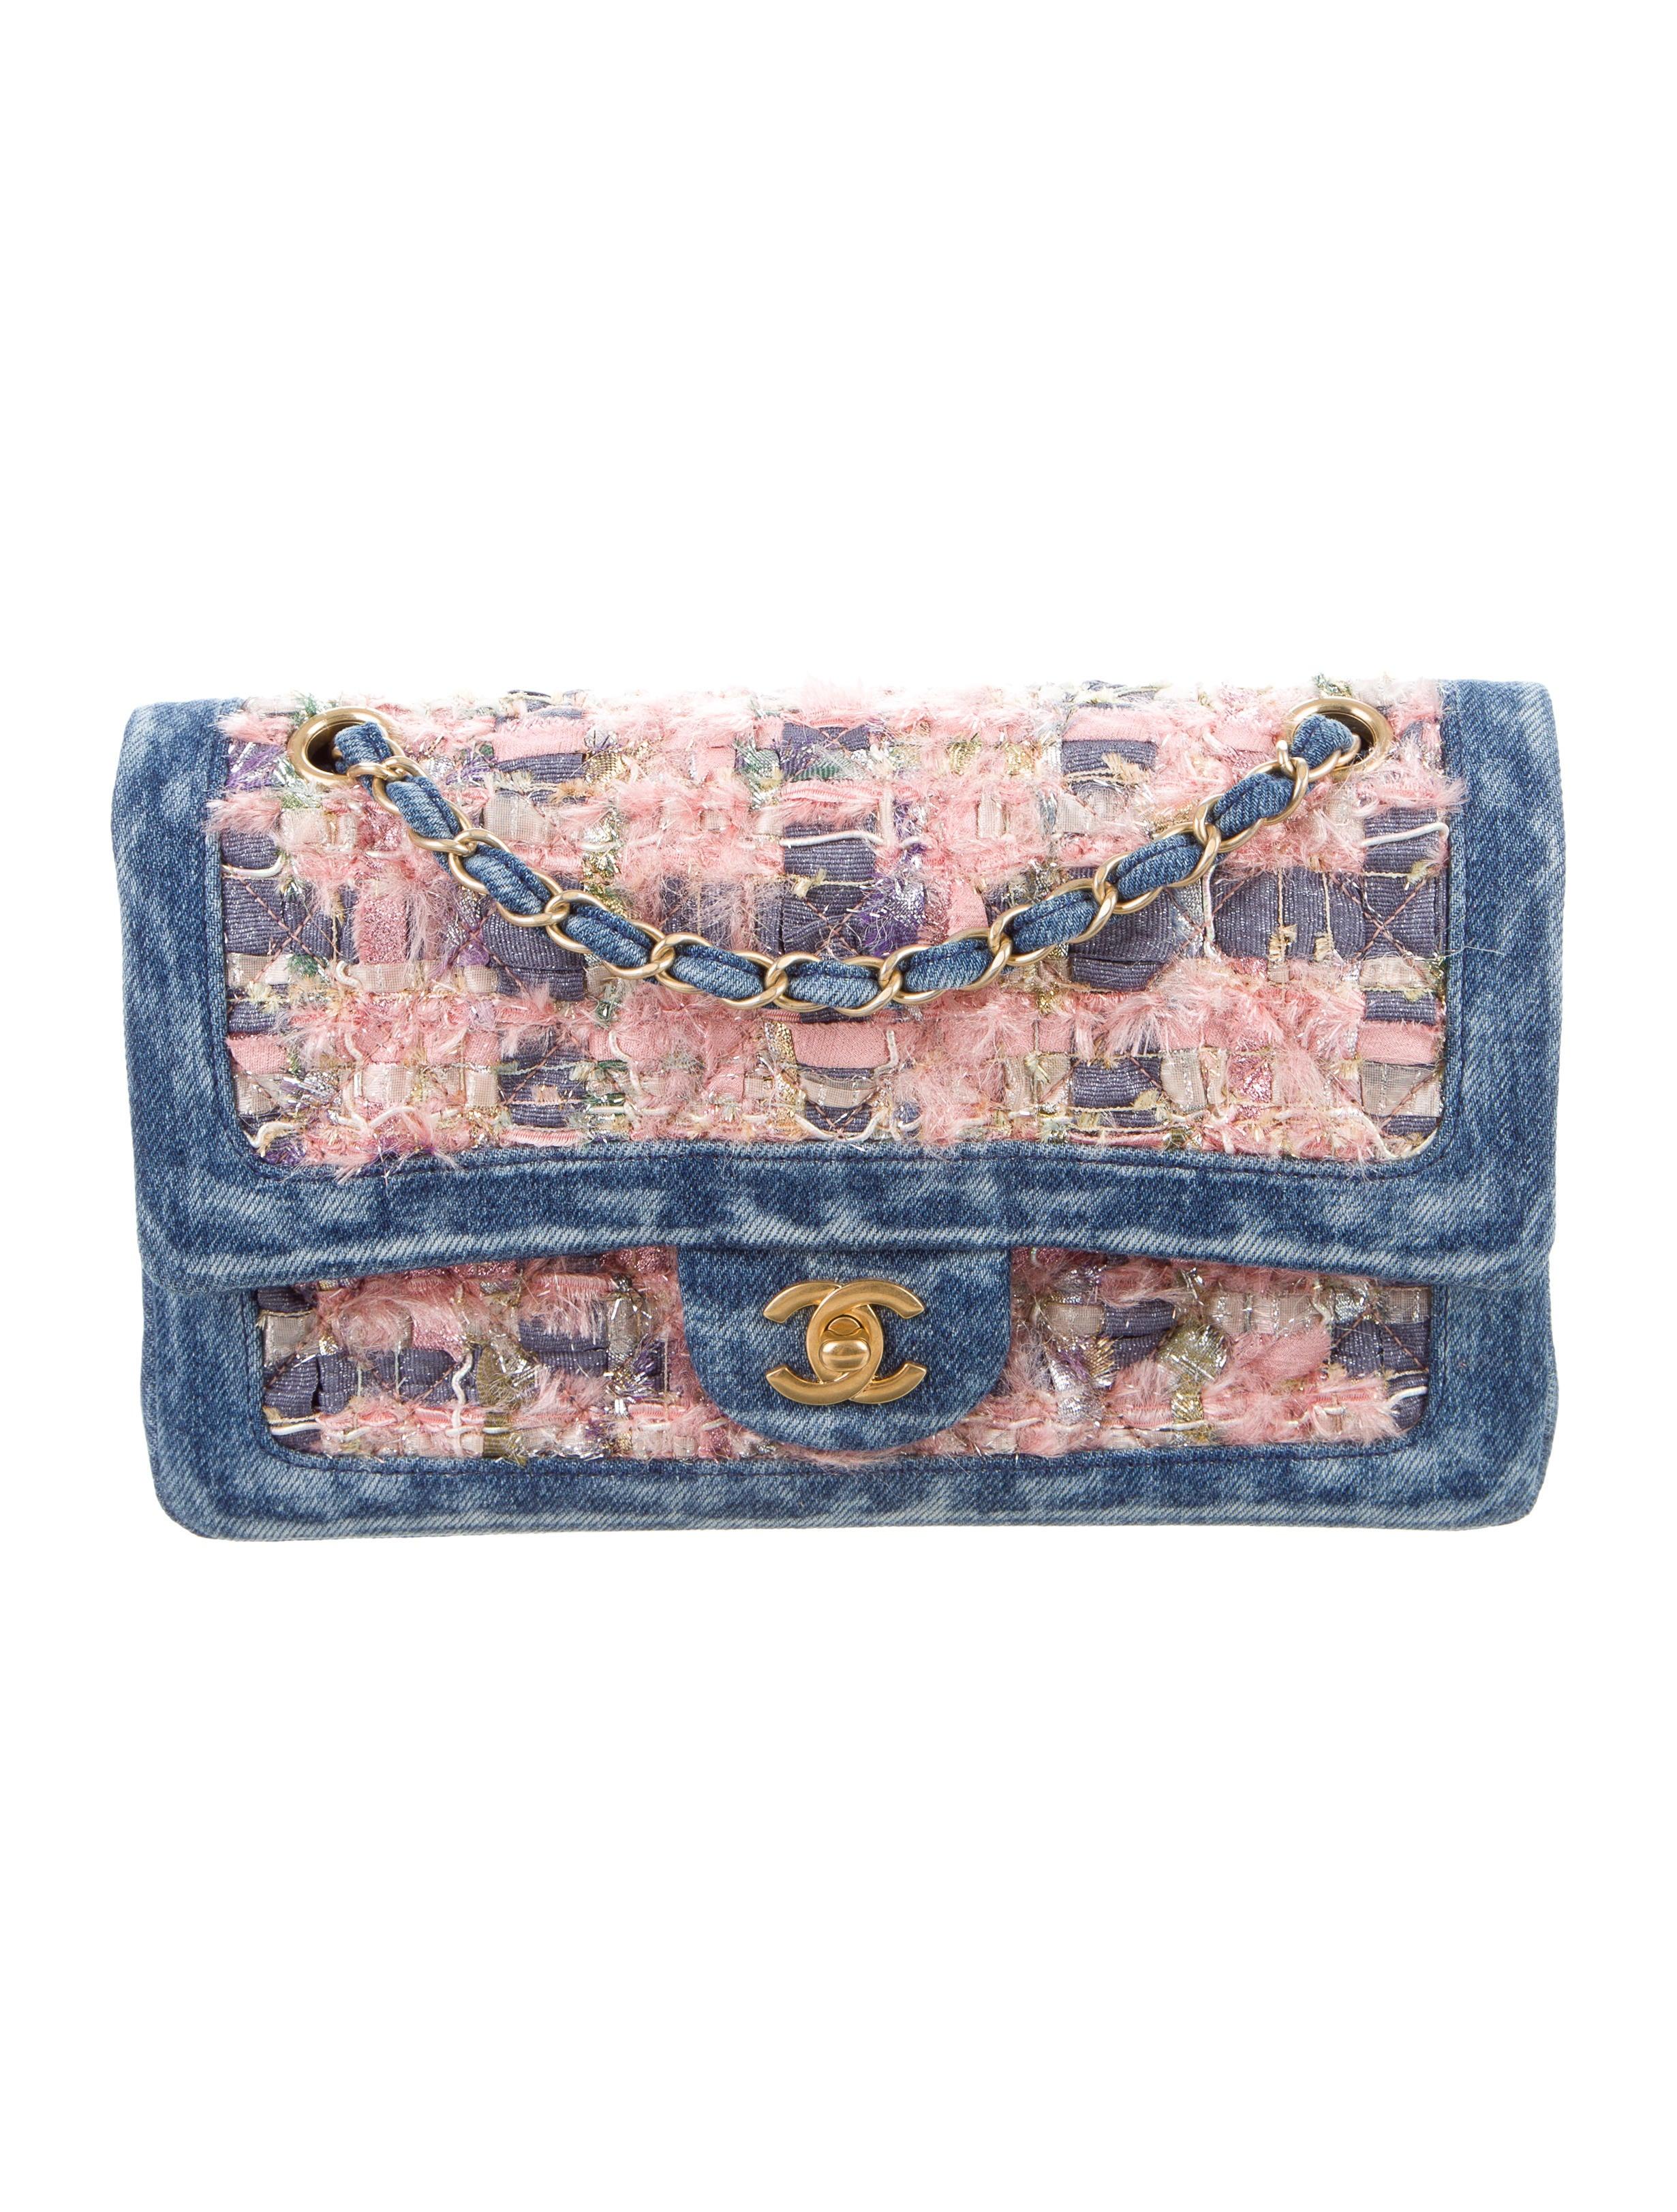 cc6aaf1aae26 Chanel 2016 Denim Tweed Classic Flap Bag w  Tags - Handbags ...